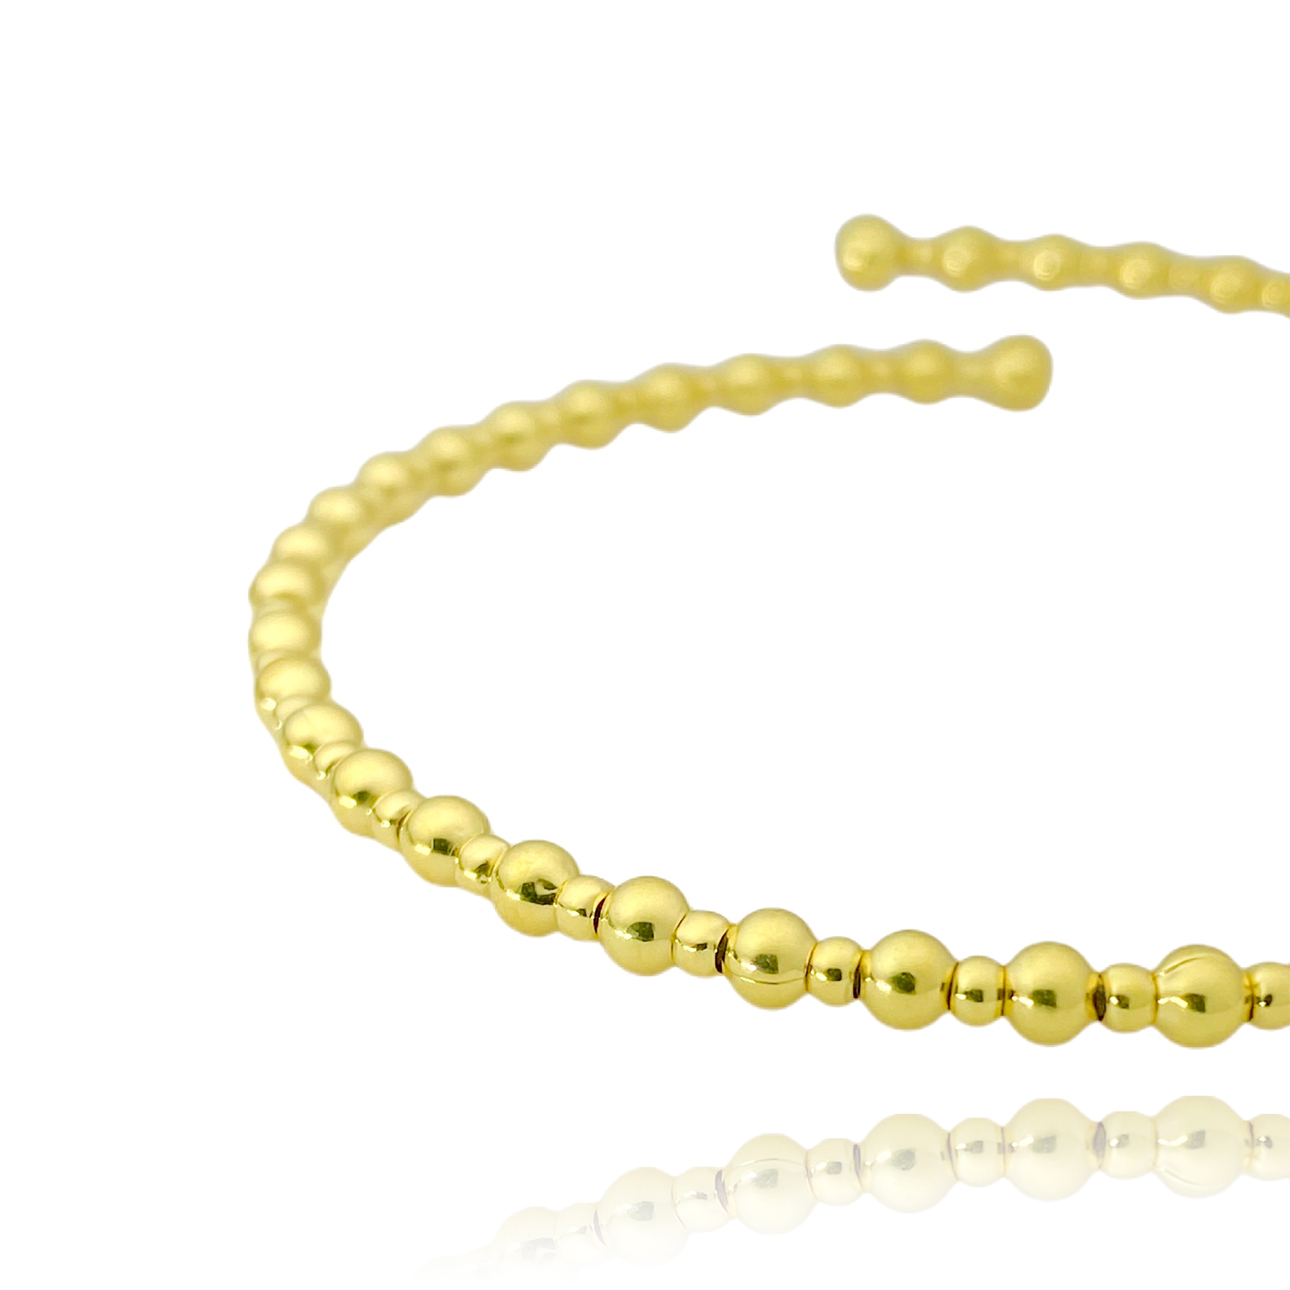 Bracelete 1 por 1 Esferas (Banho Ouro 24k)